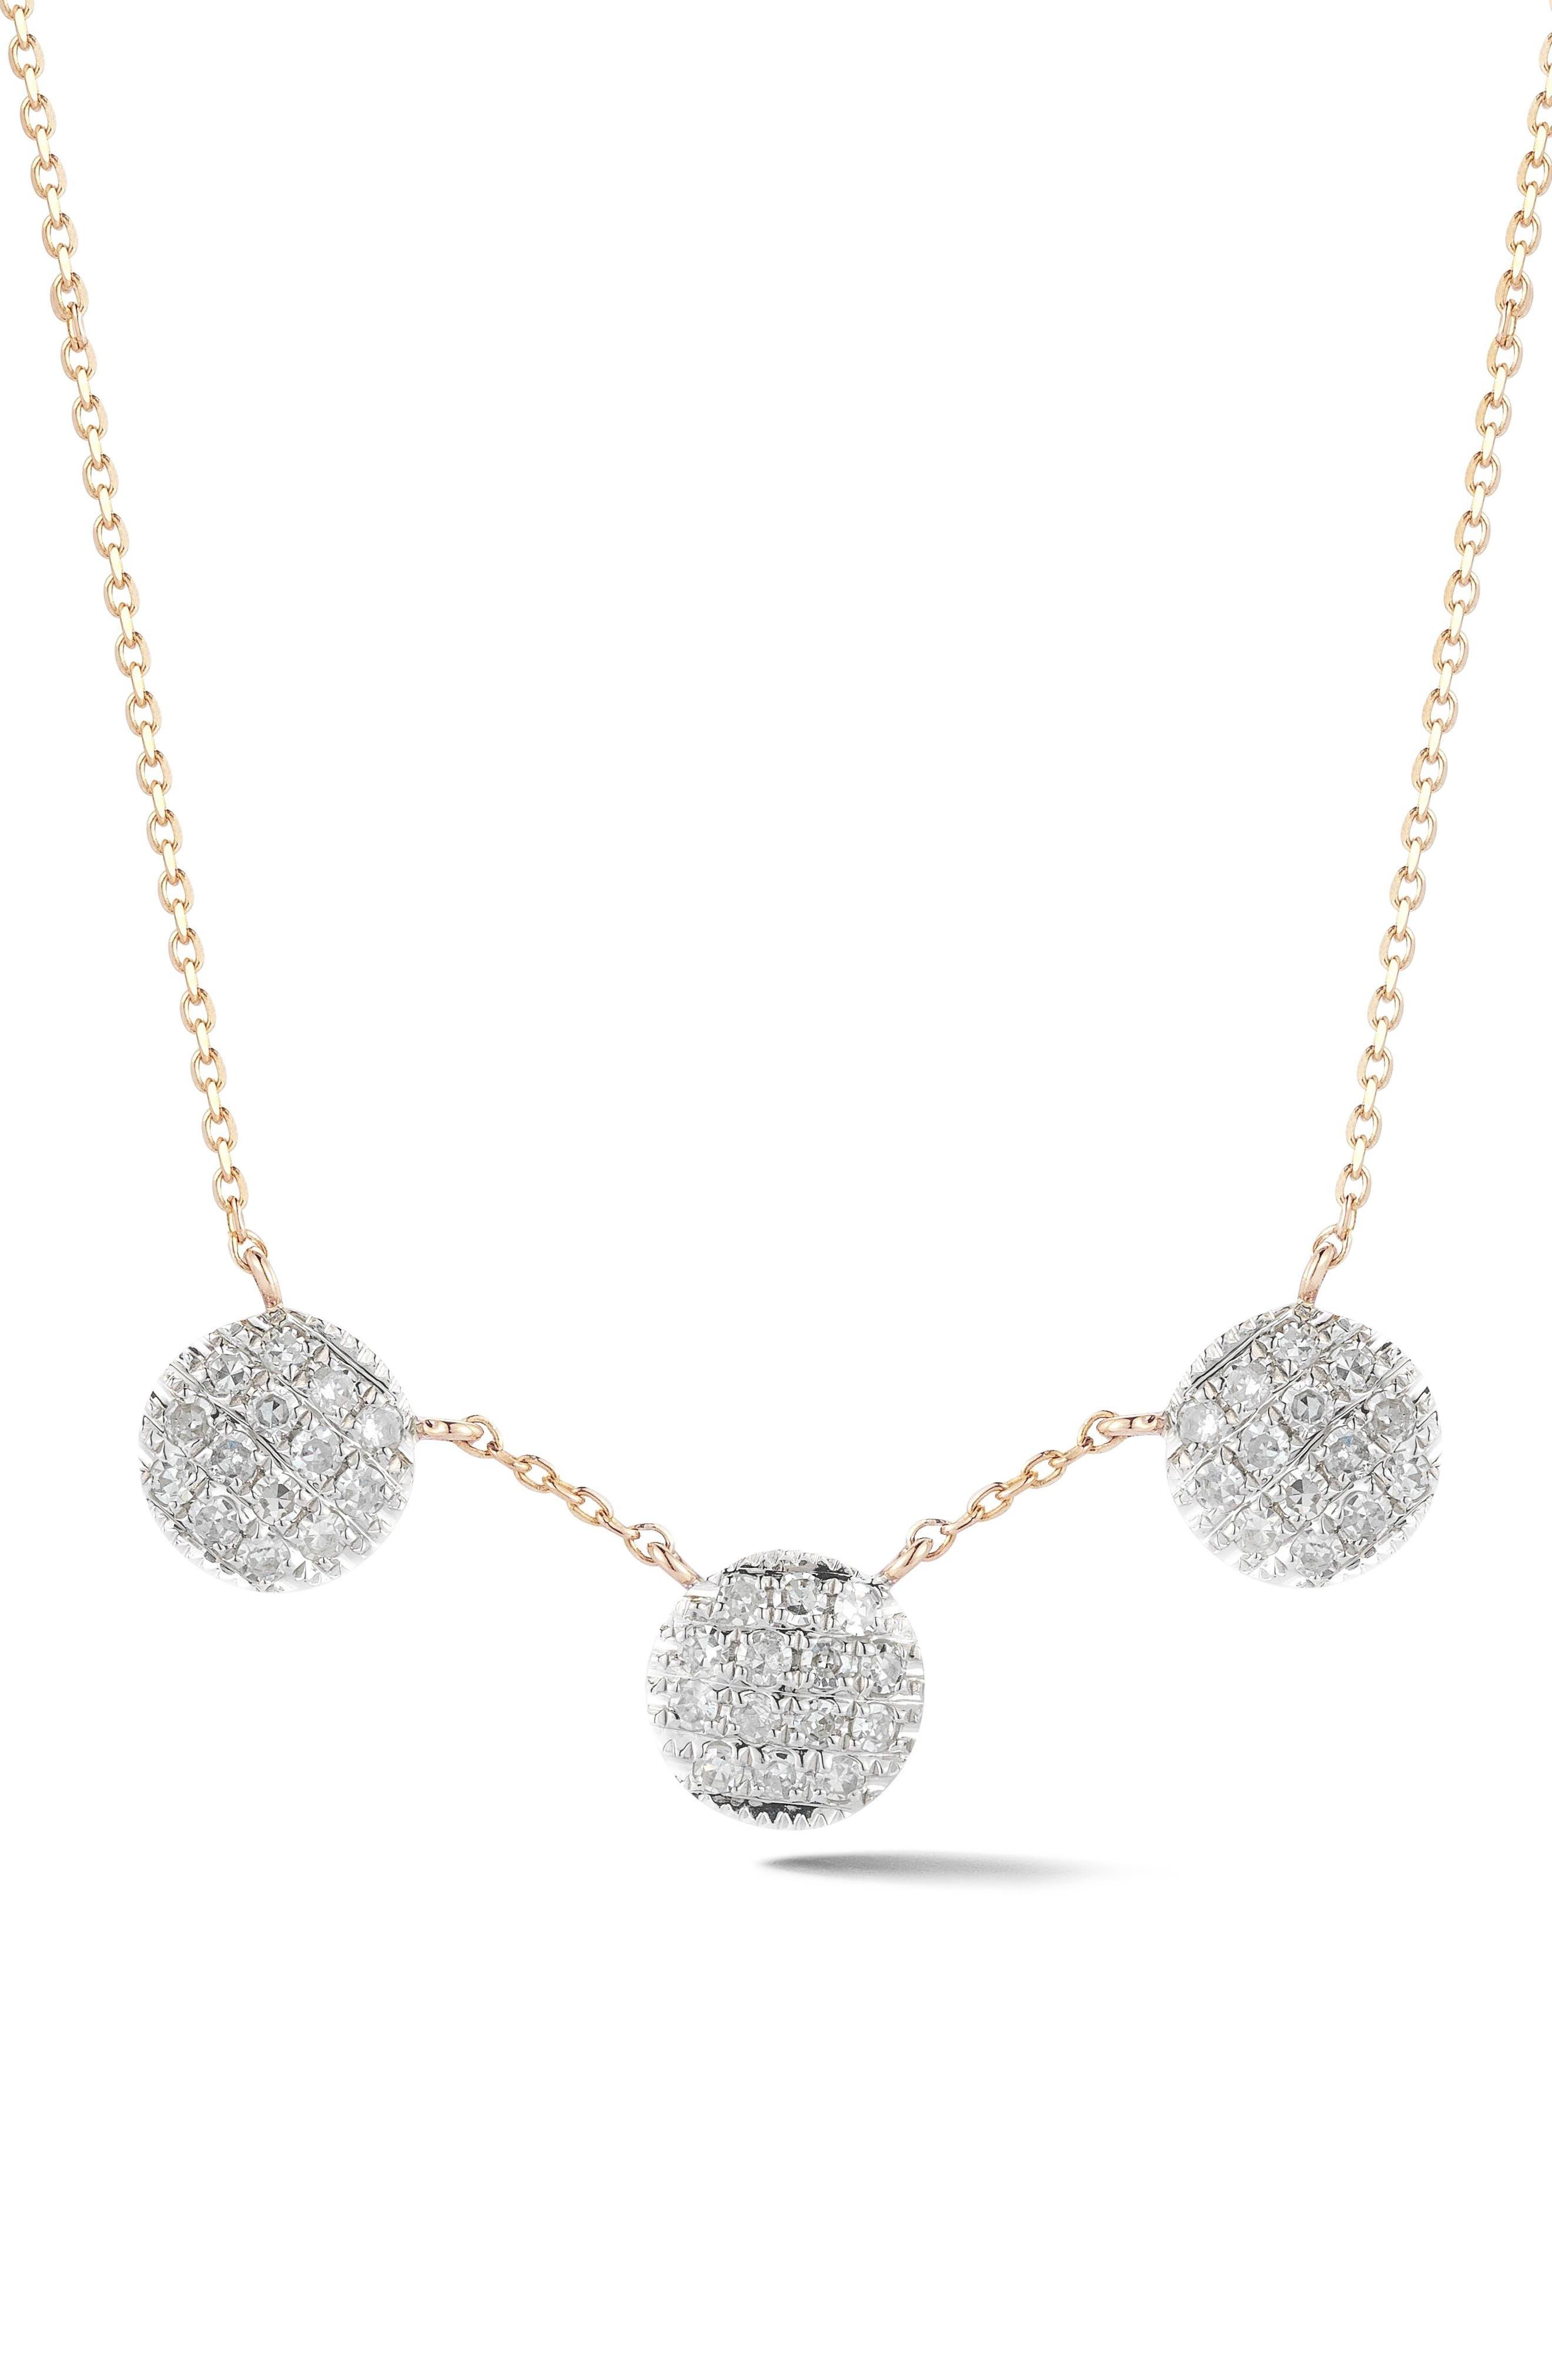 Alternate Image 1 Selected - Dana Rebecca Designs Lauren Joy Three-Disc Diamond Necklace